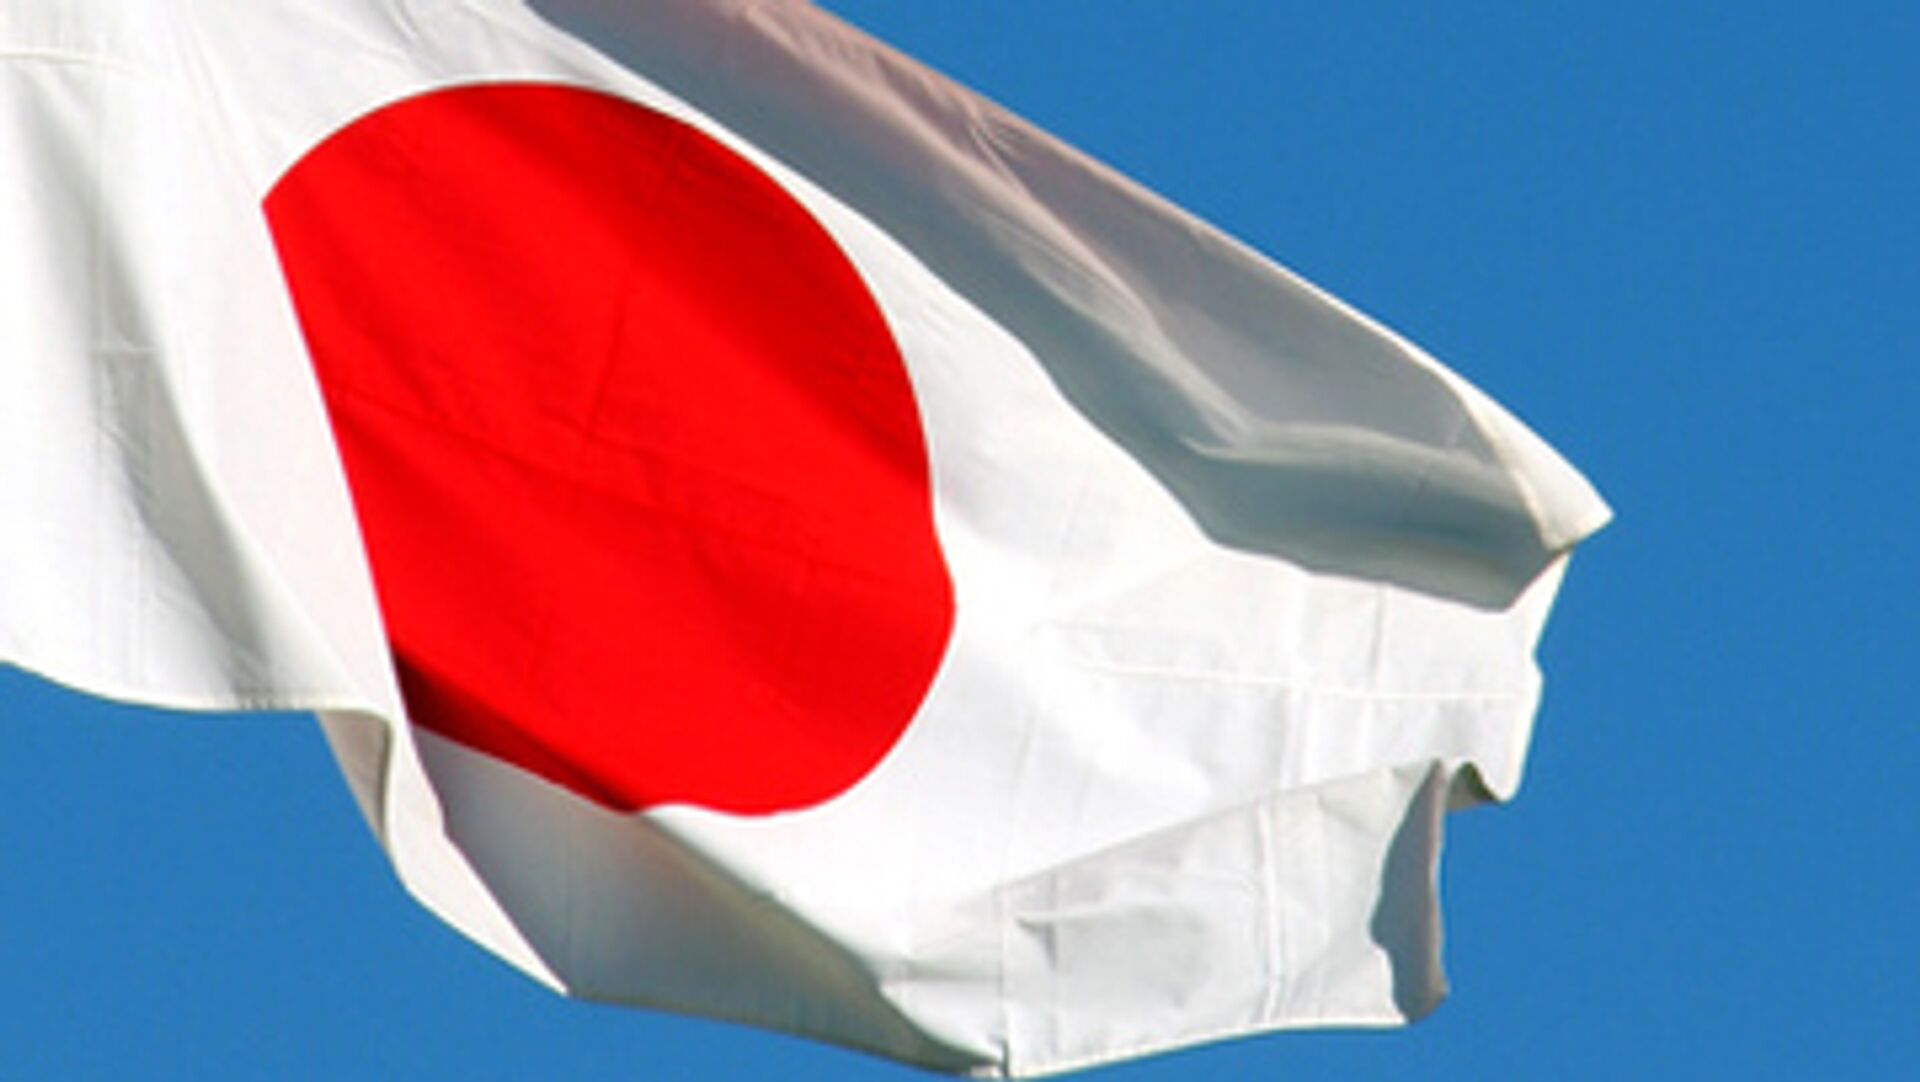 Флаг Японии - РИА Новости, 1920, 10.09.2021